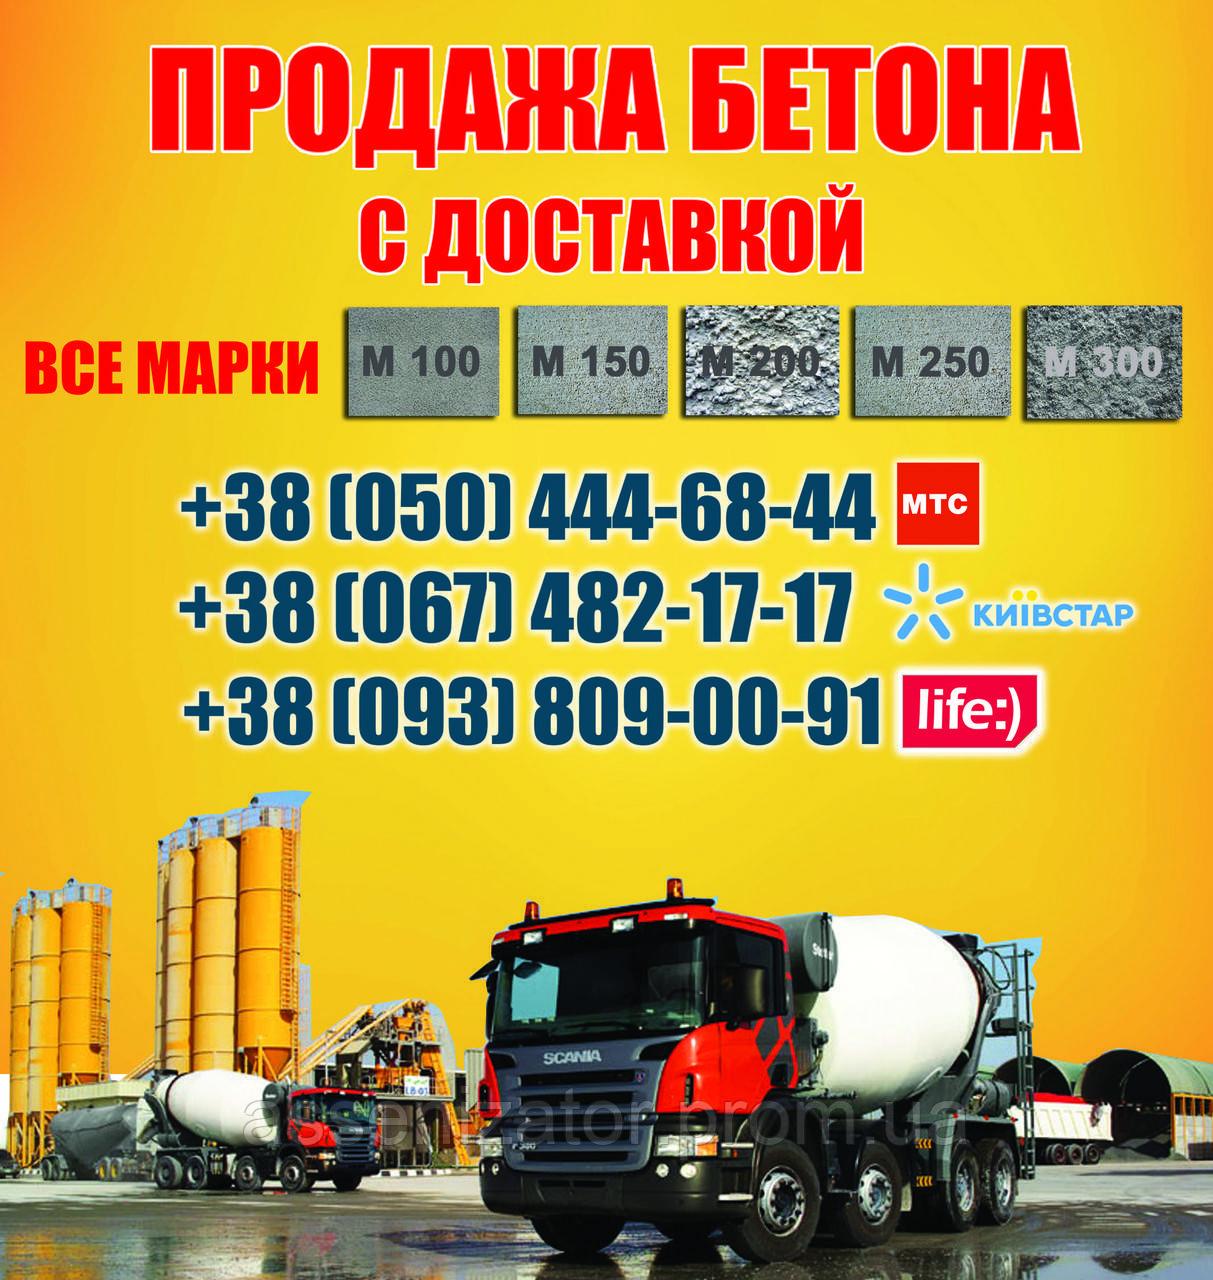 Бетон Чугуев. Купить бетон в Чугуеве. Цена за куб по Чугуеву. Купить с доставкой бетон ЧУГУЕВ.